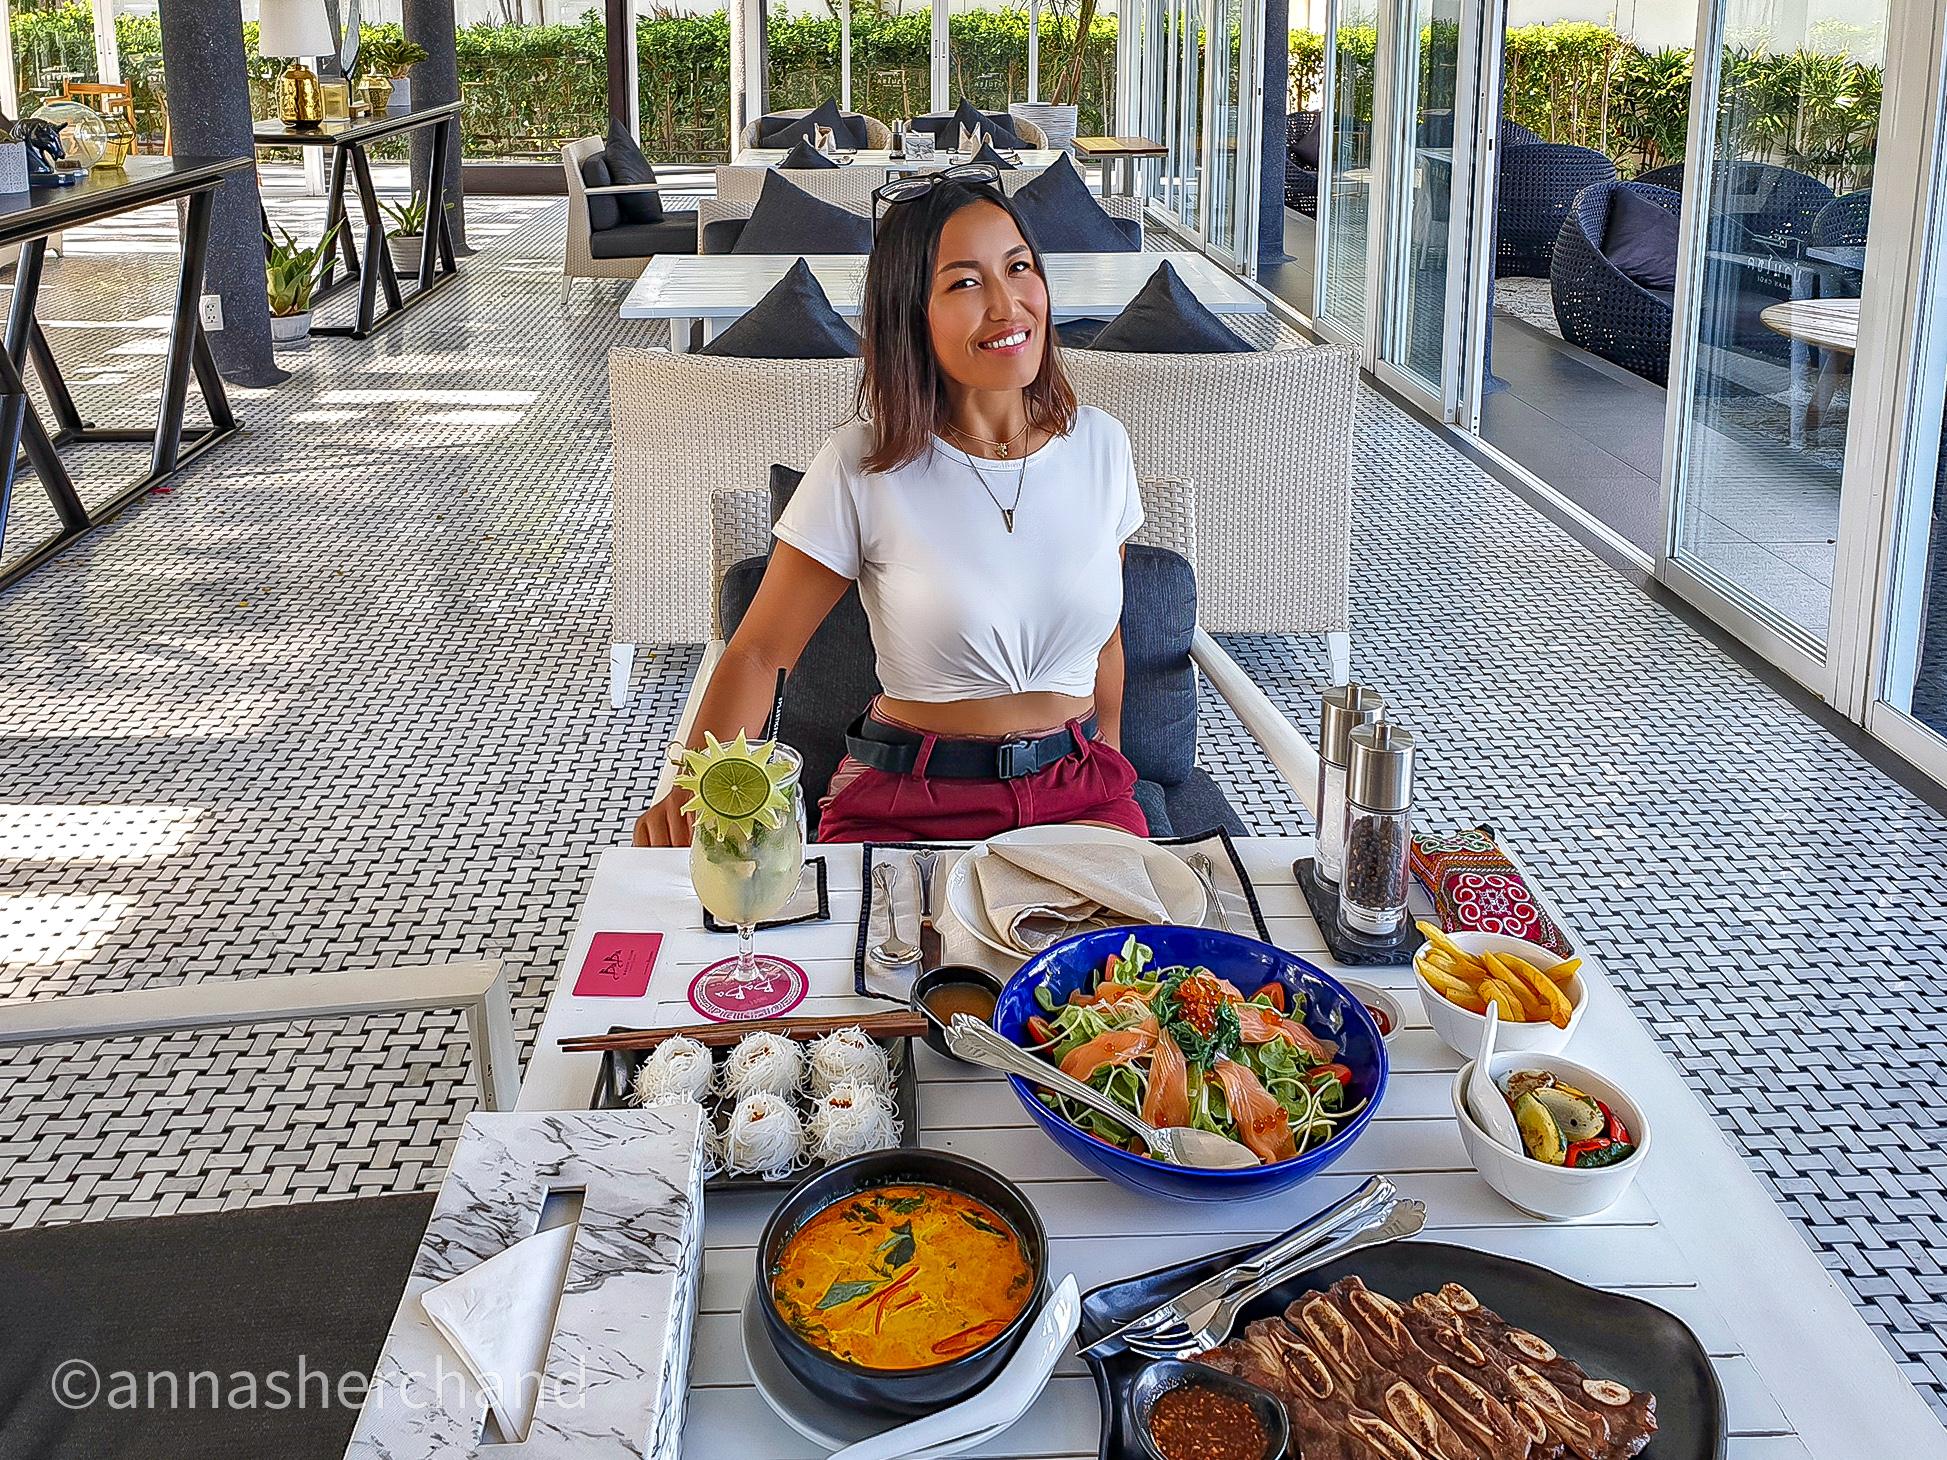 Food travel blogger from Australia